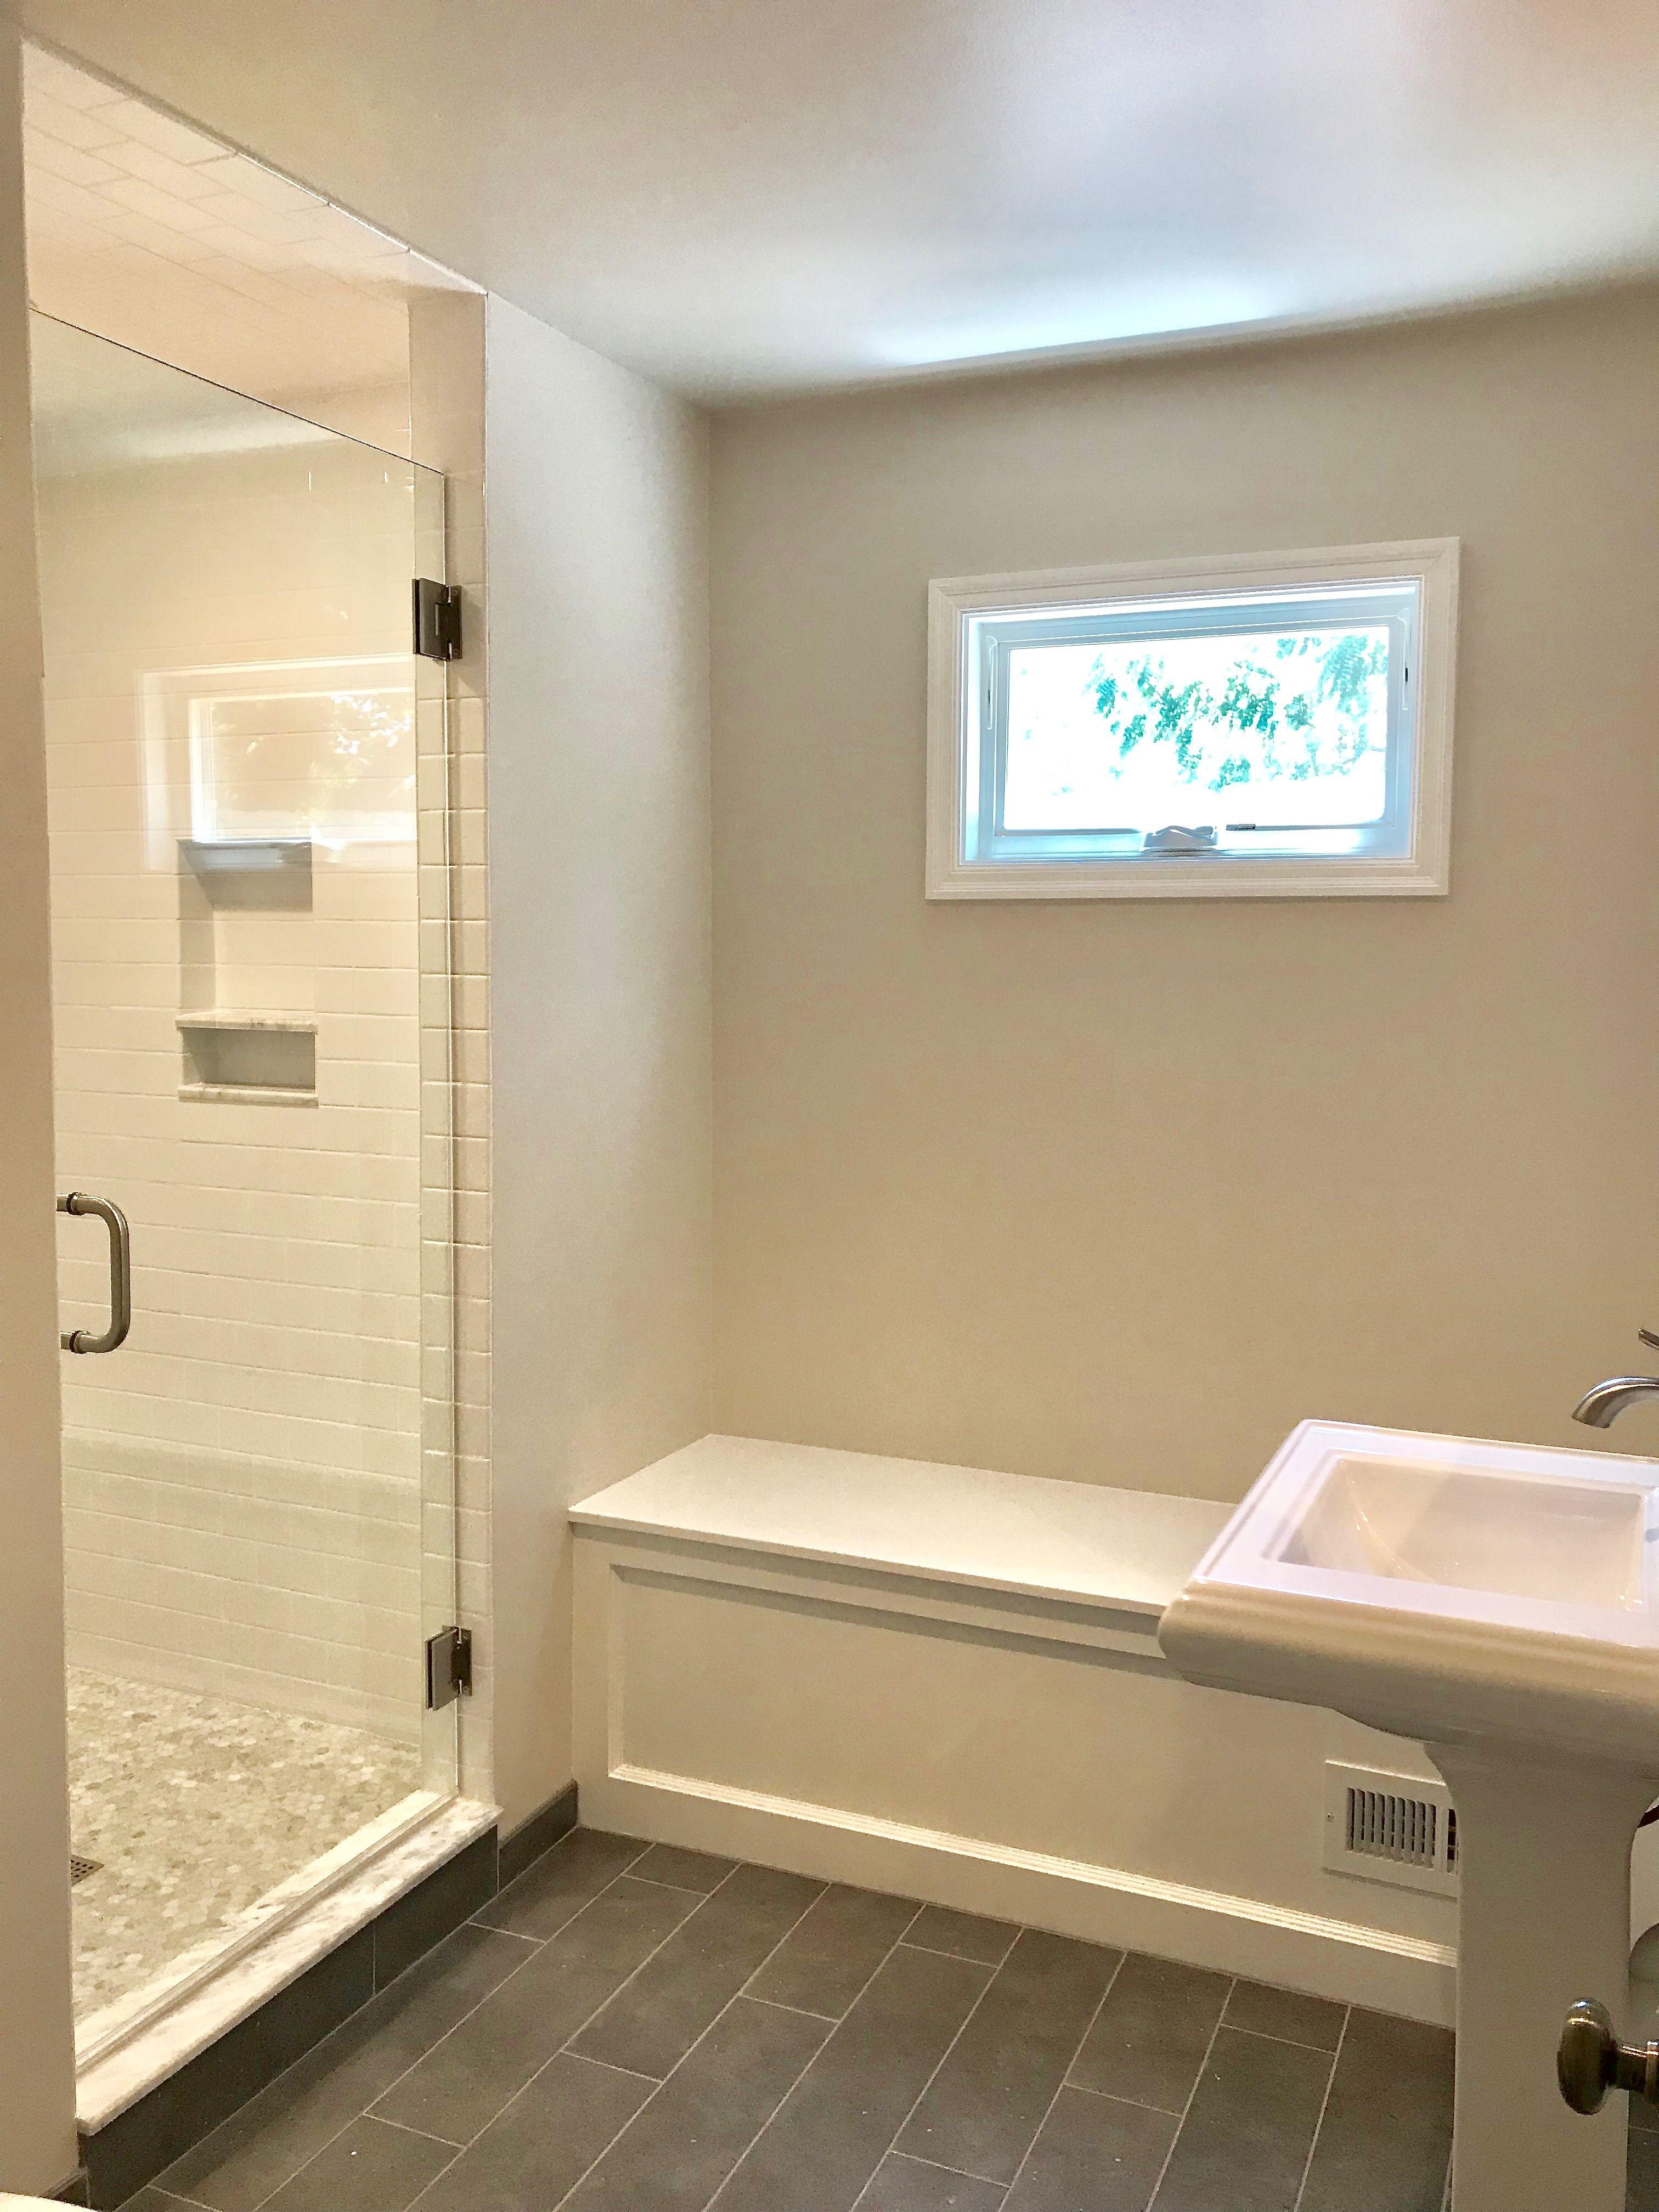 Kohler Memoirs 24 Pedestal Sink With Mirabelle Provincetown